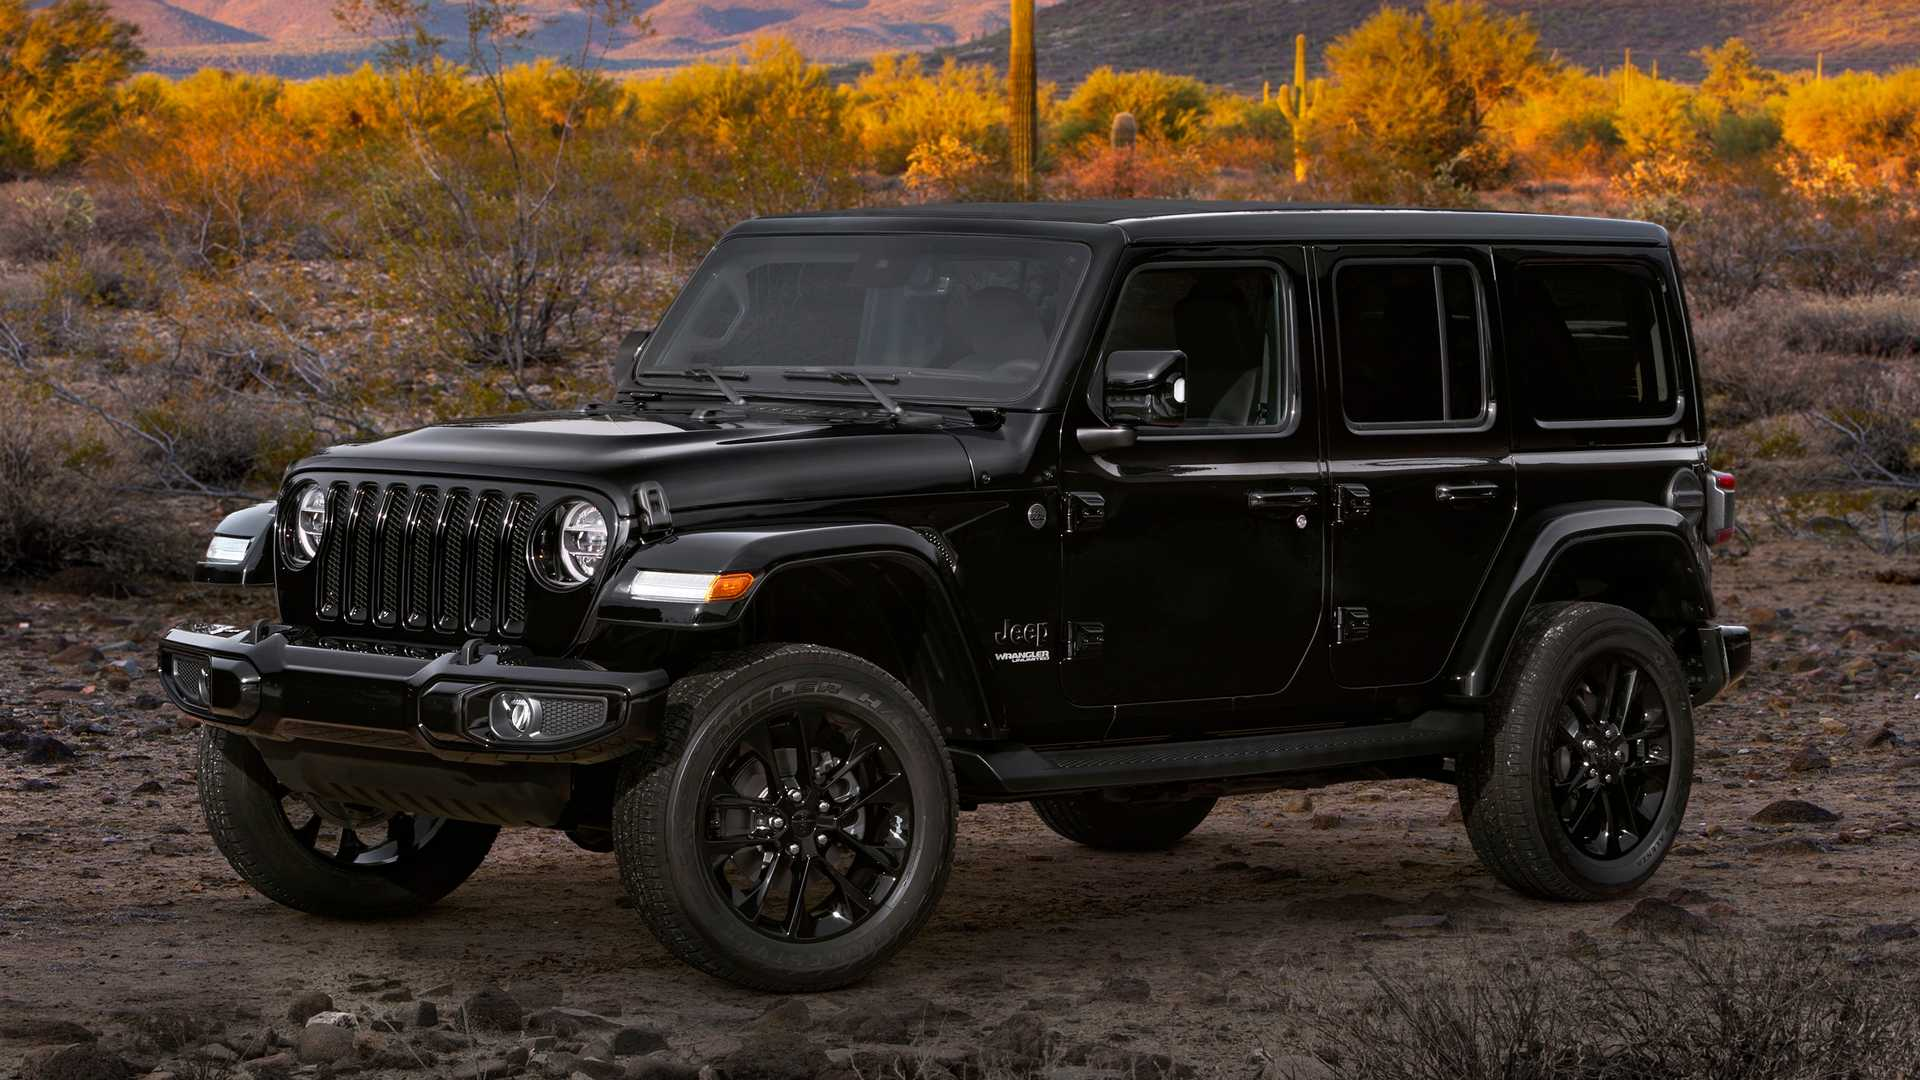 2020-jeep-wrangler-high-altitude